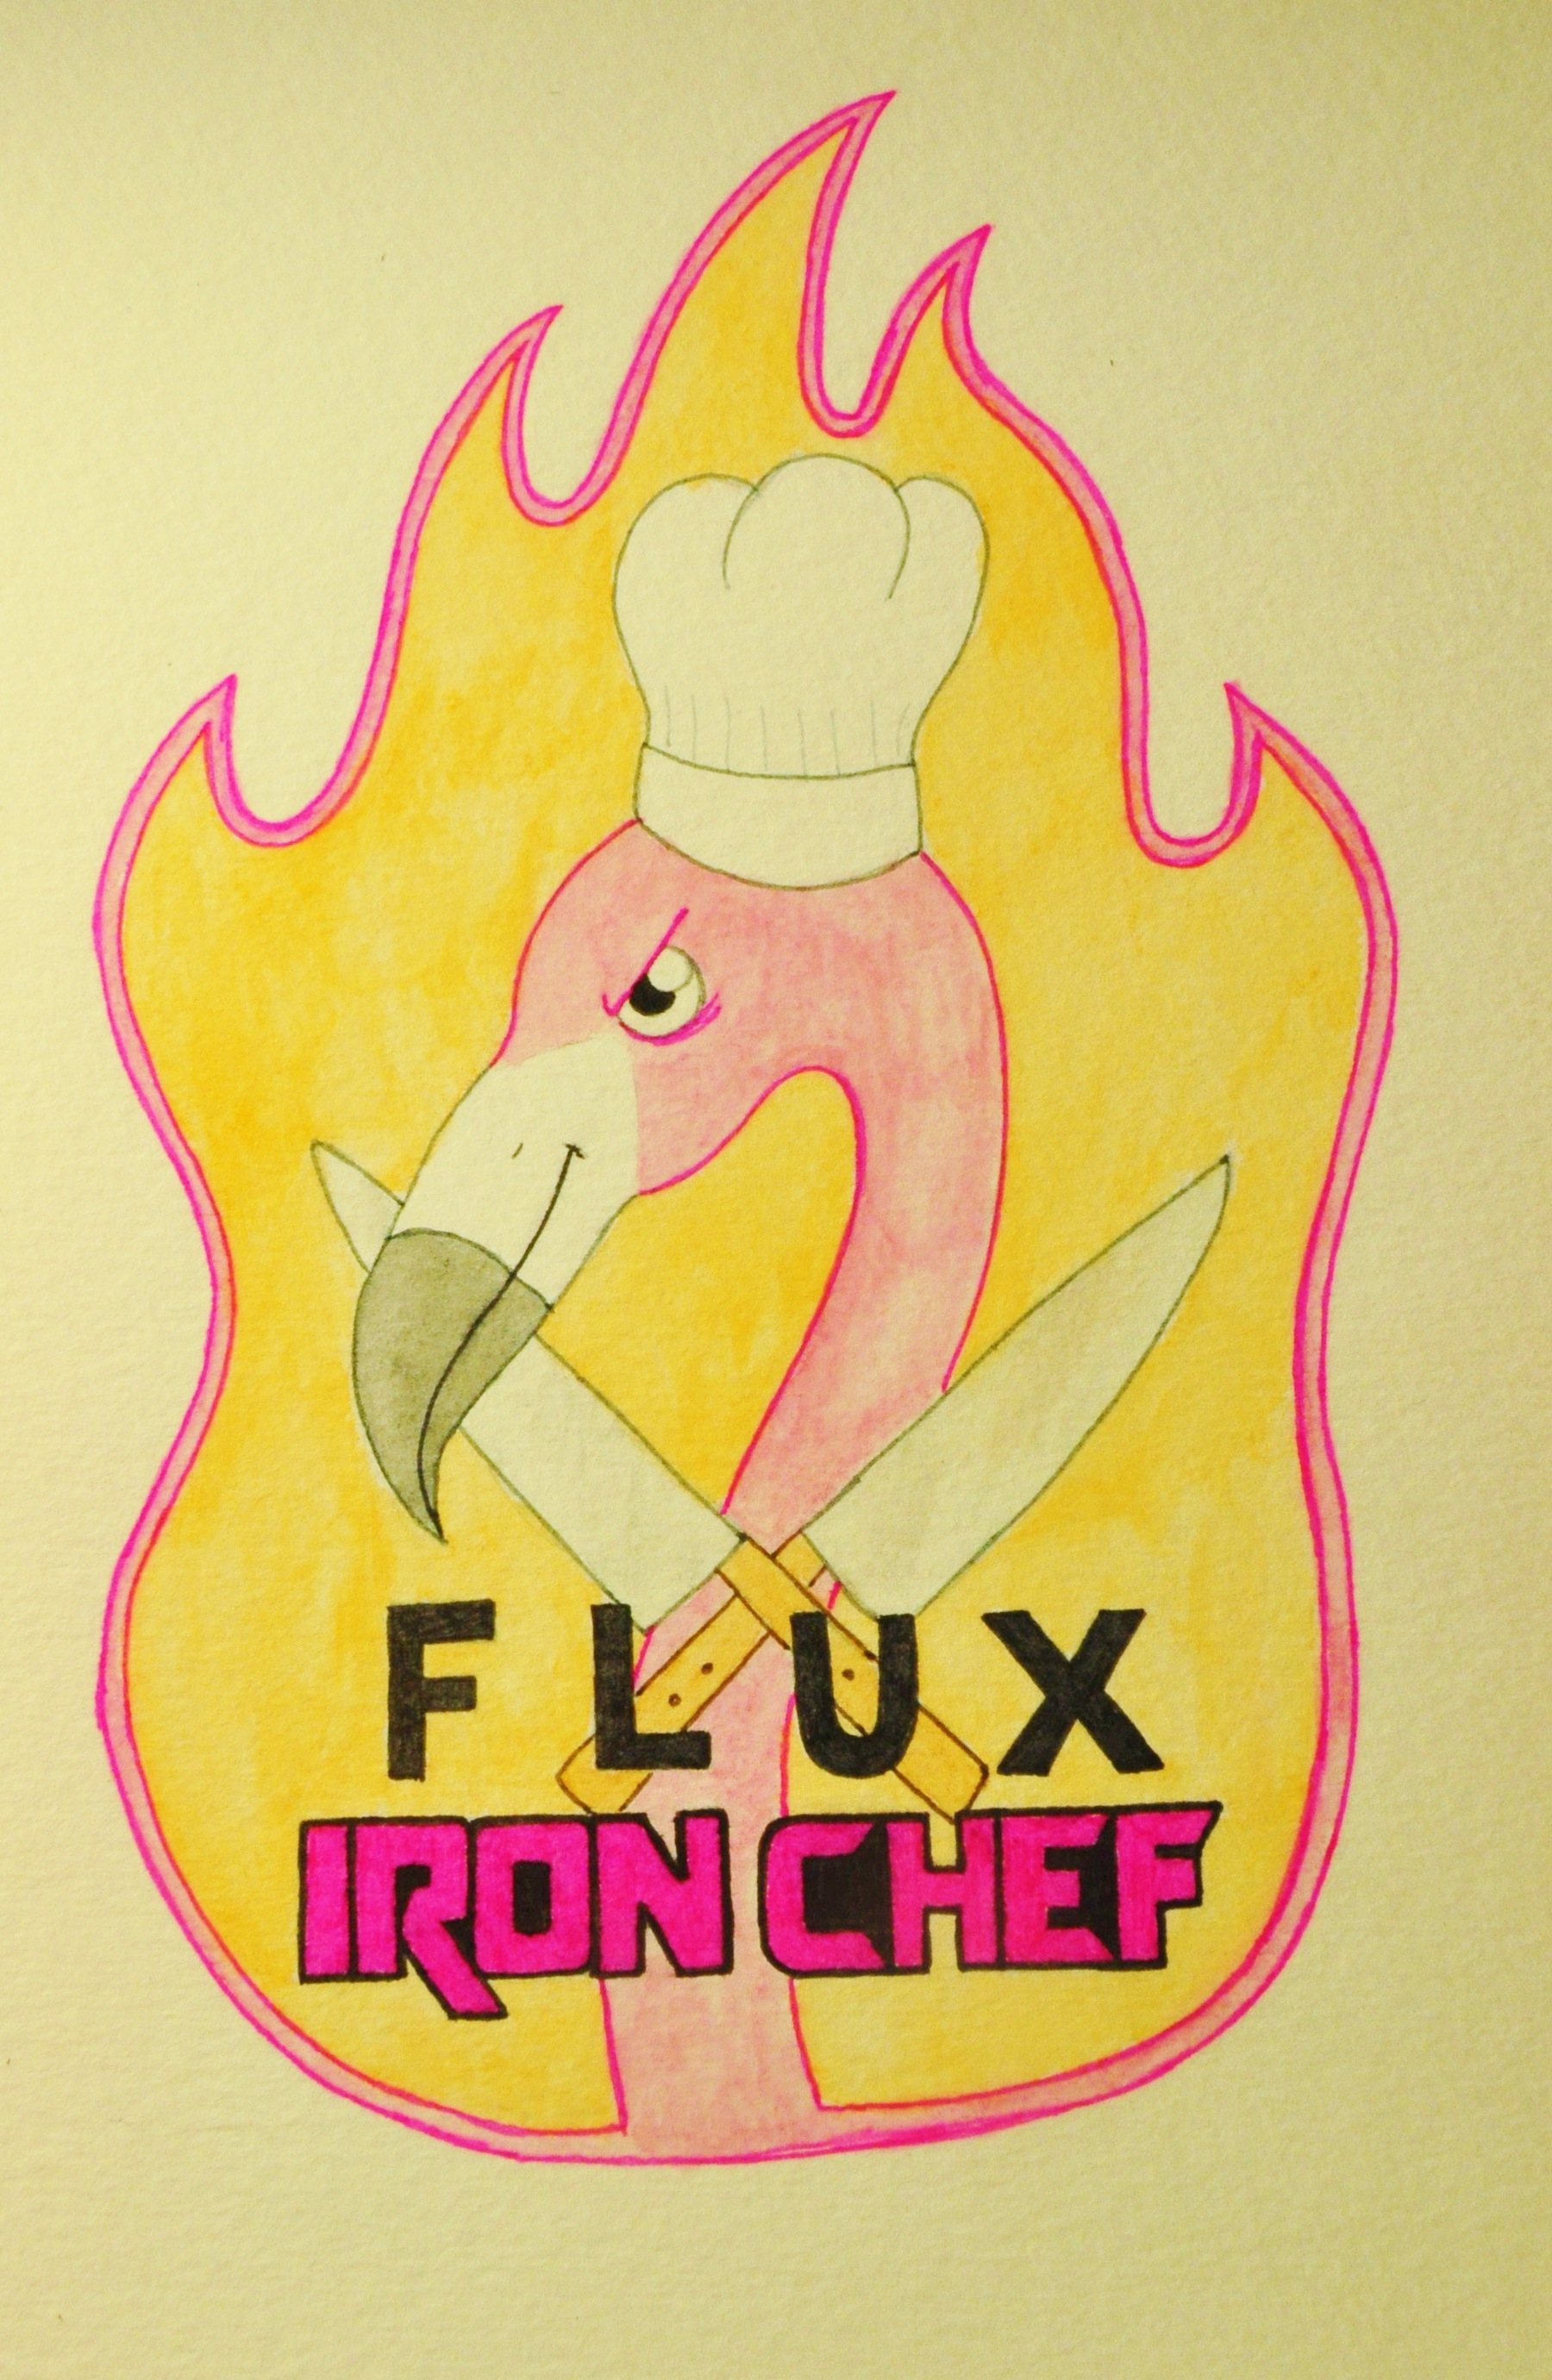 Iron Chef Flux